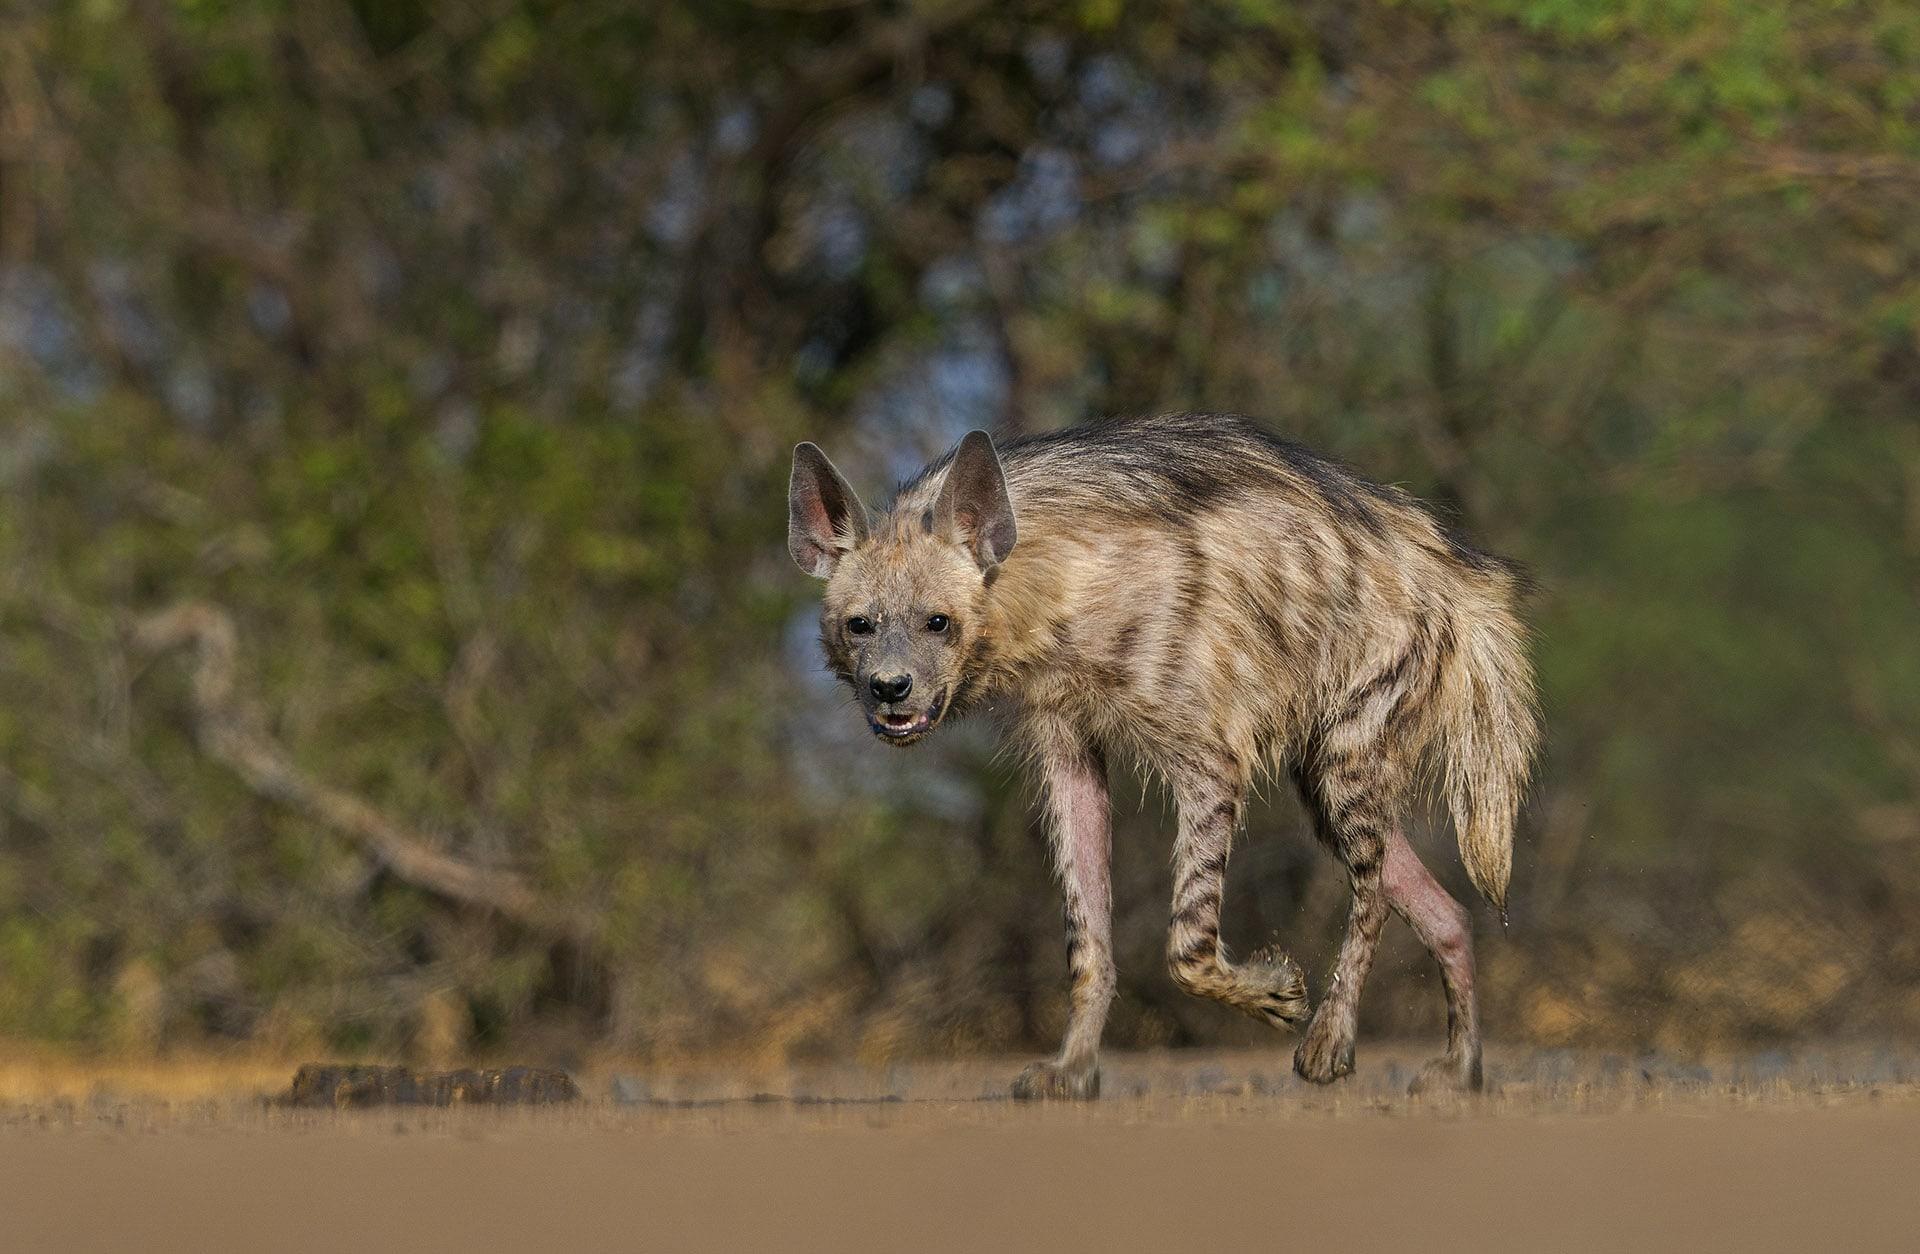 Canids are feared predators in Velavadar. The park has thriving populations of wolves (top) and striped hyenas (below), both predator of blackbuck and nilgai. Photos: Pratim Partha Kundu (top), Dhritiman Mukherjee (above)